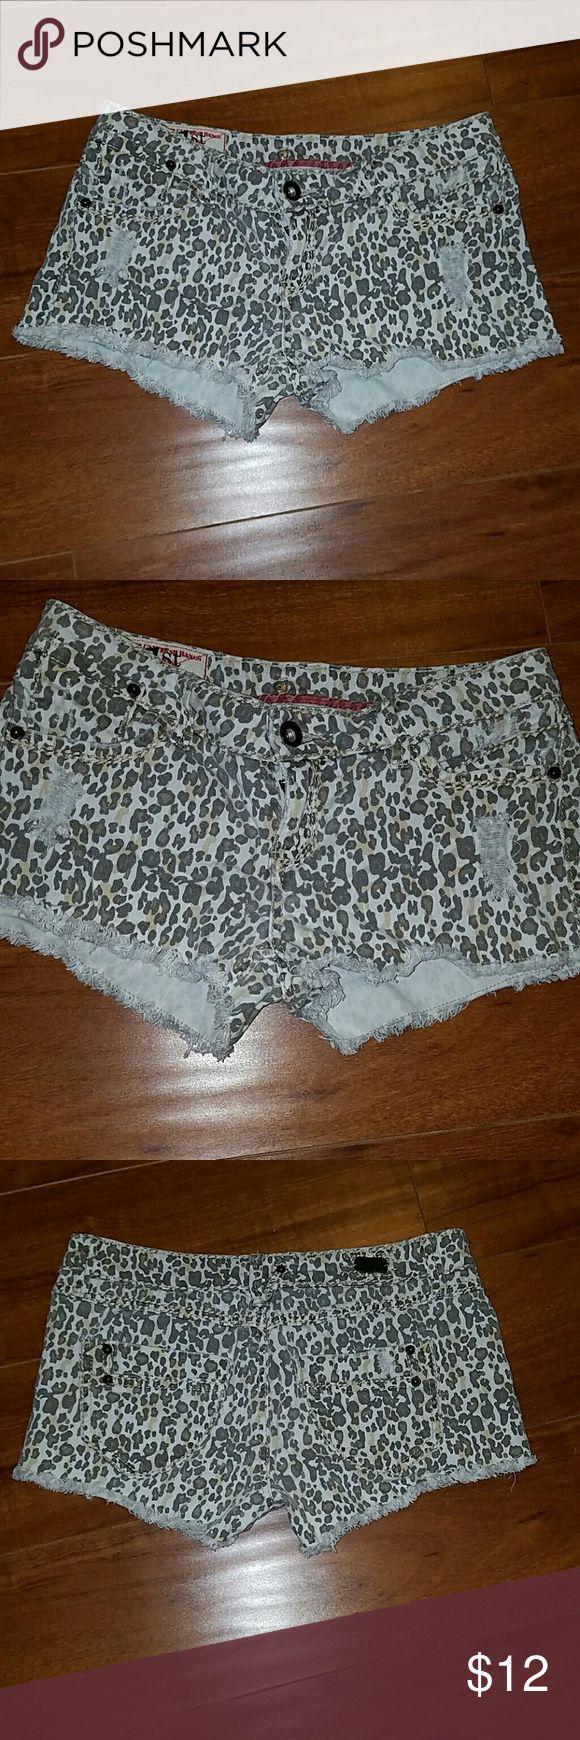 Cheetah shorts 1st kiss cheetah demin shorts 98% cotton 2% spandex . 1st kiss  Shorts Jean Shorts